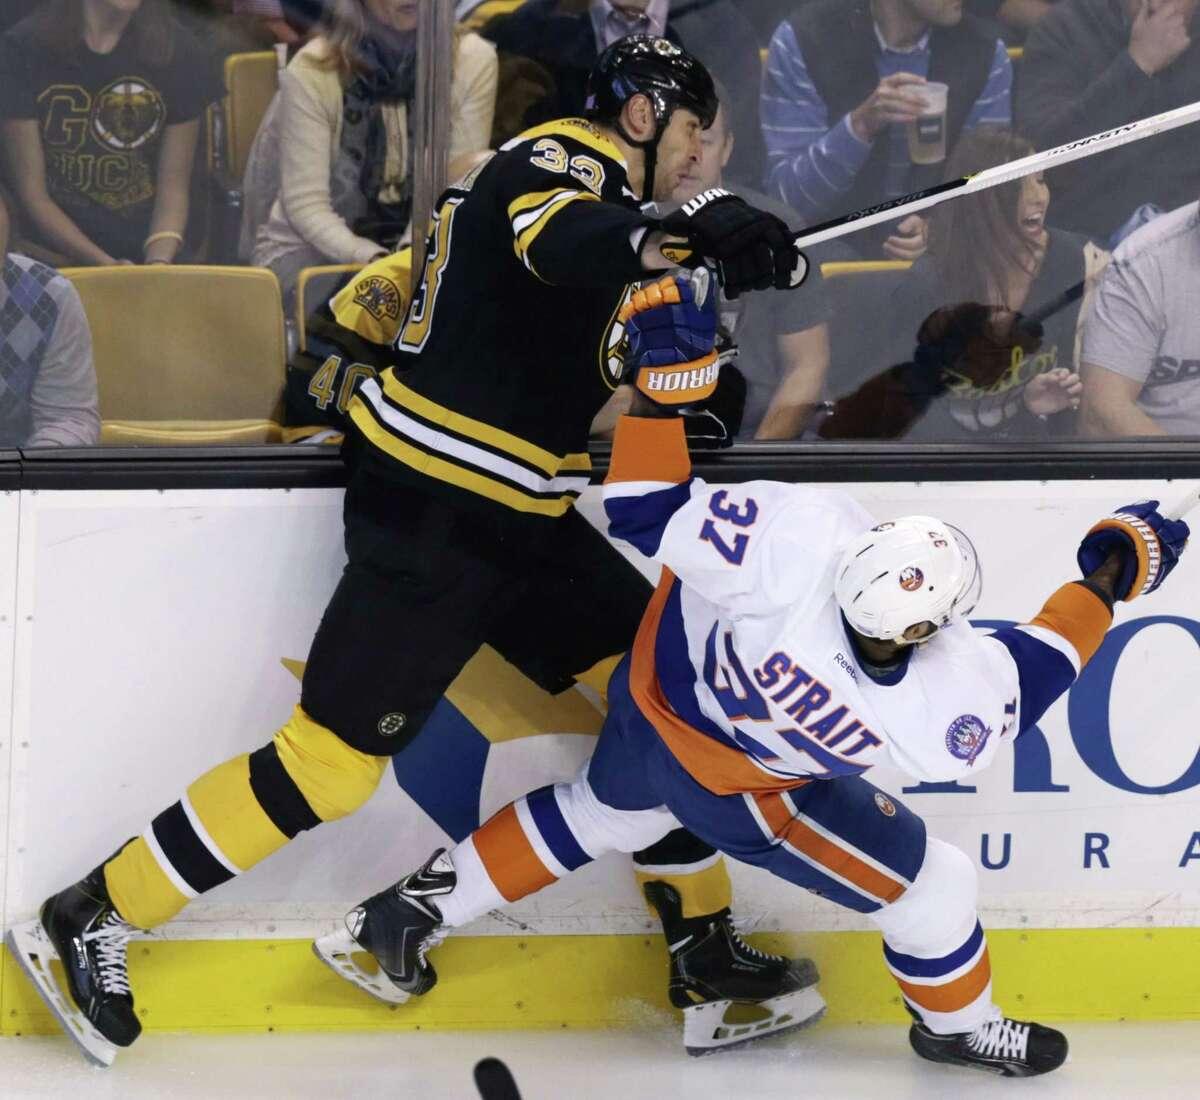 New York Islanders defenseman Brian Strait (37) collides with Bruins defenseman Zdeno Chara during the first period of Thursday night's game in Boston.